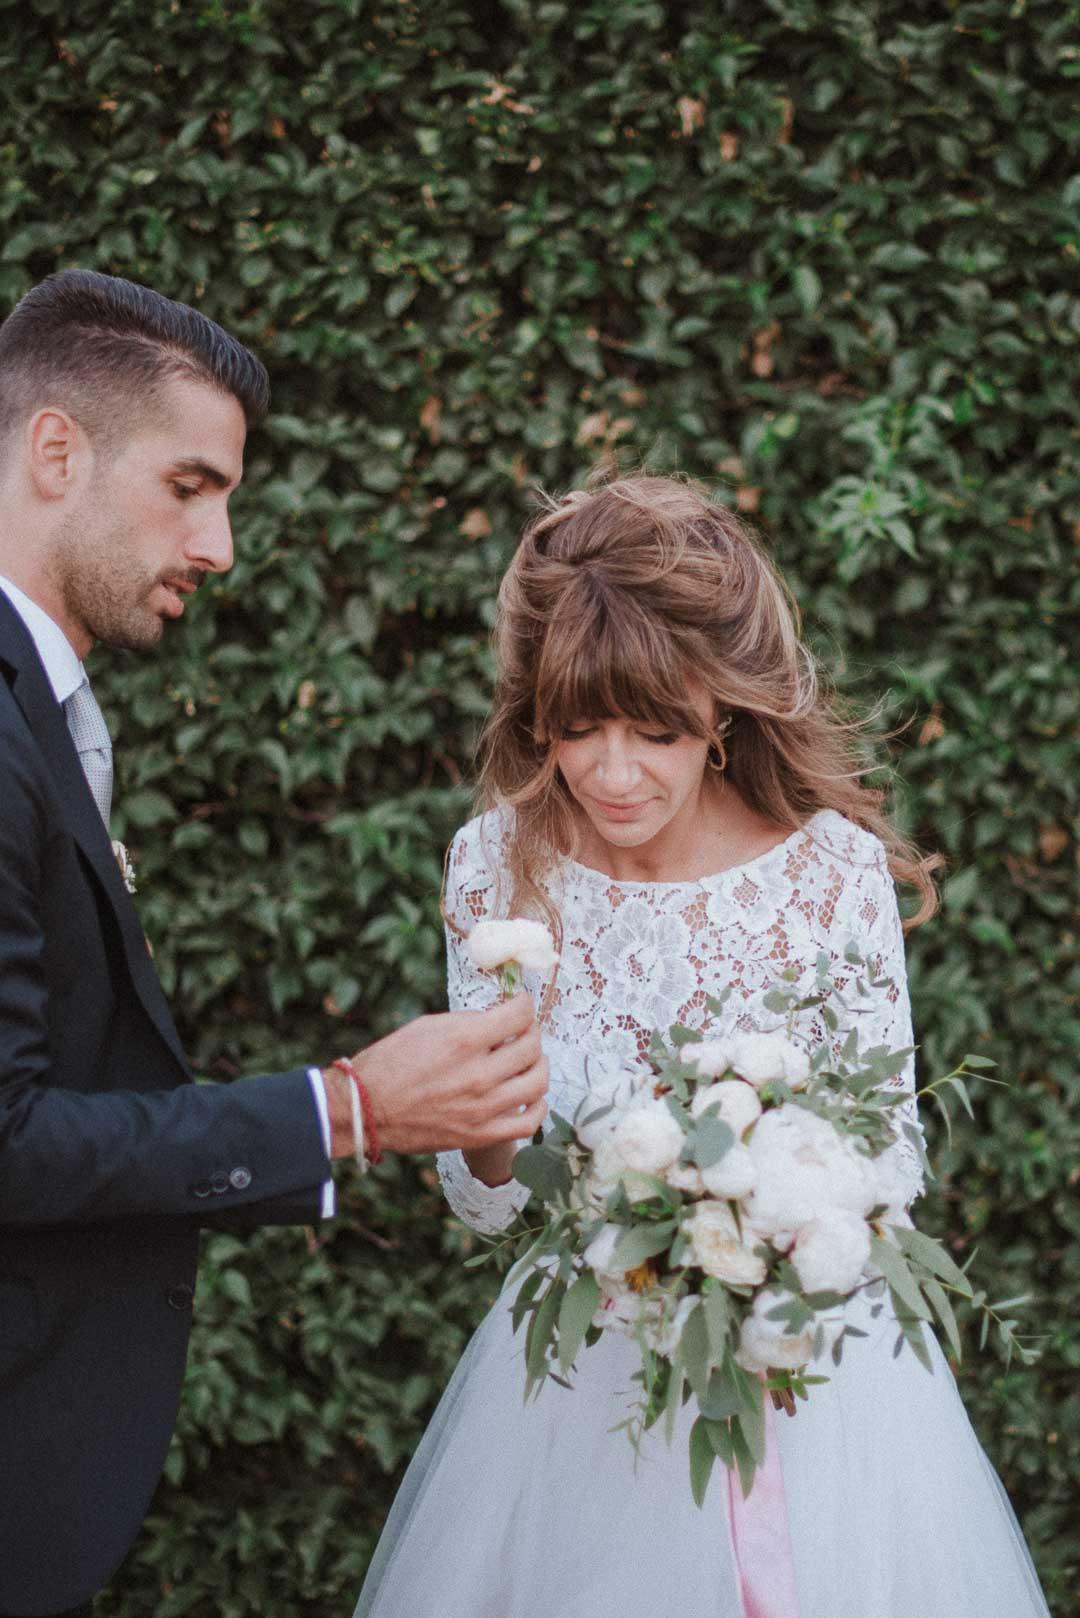 wedding-photographer-destination-fineart-bespoke-reportage-napoli-nabilah-vivianeizzo-spazio46-92